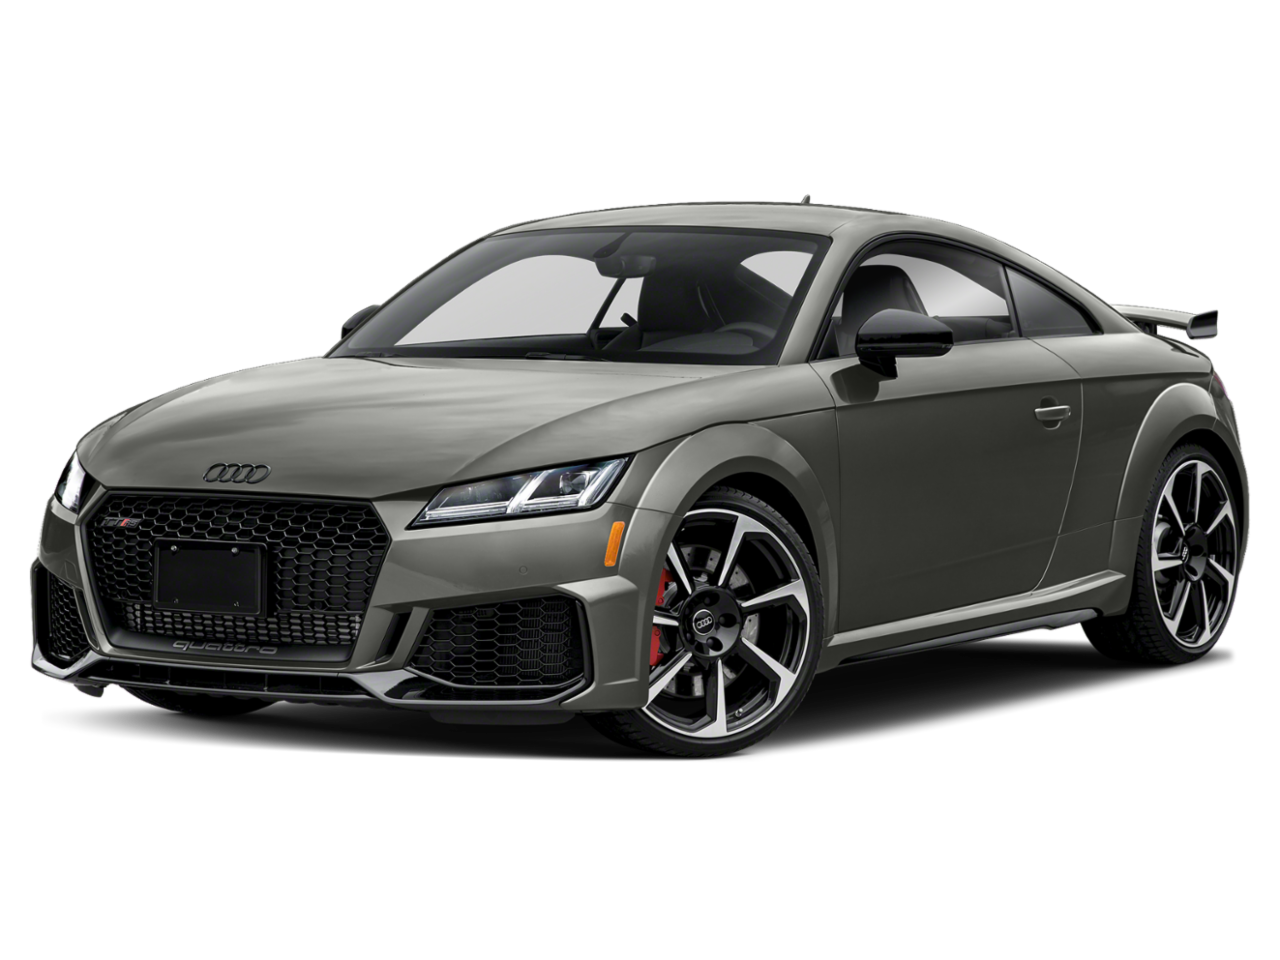 Audi 2021 TT RS 2.5 TFSI